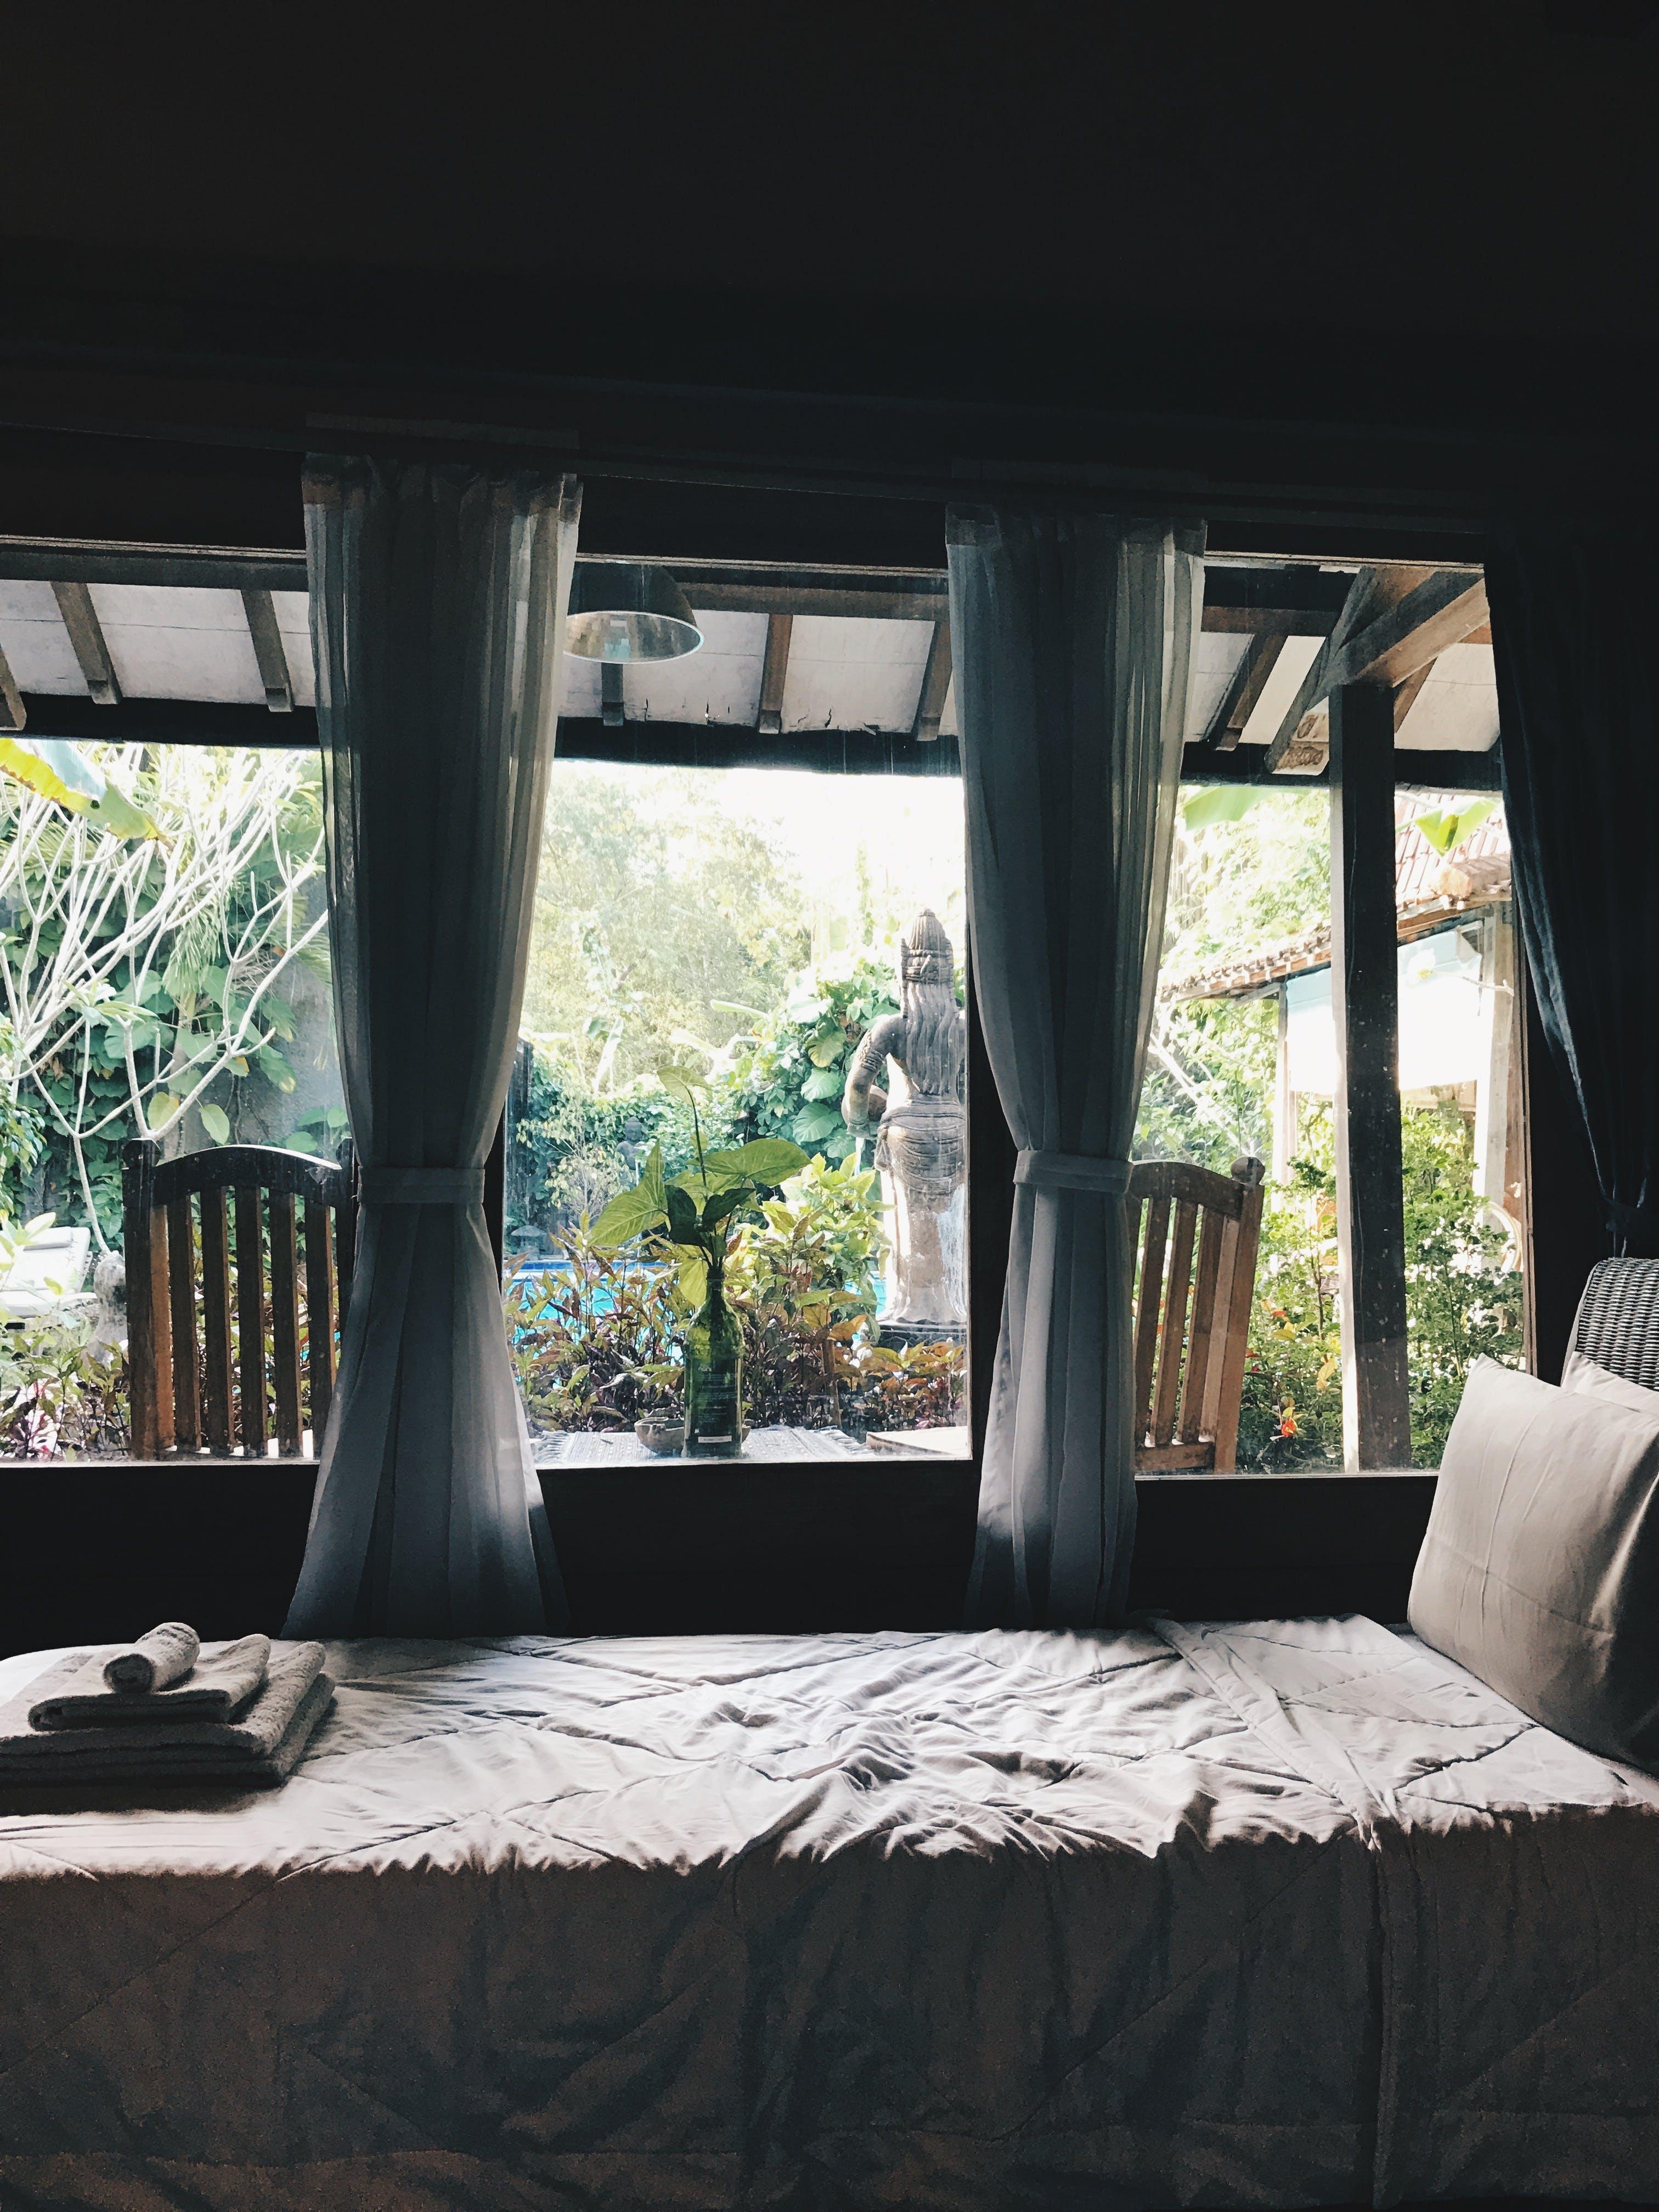 White Bed Near Window